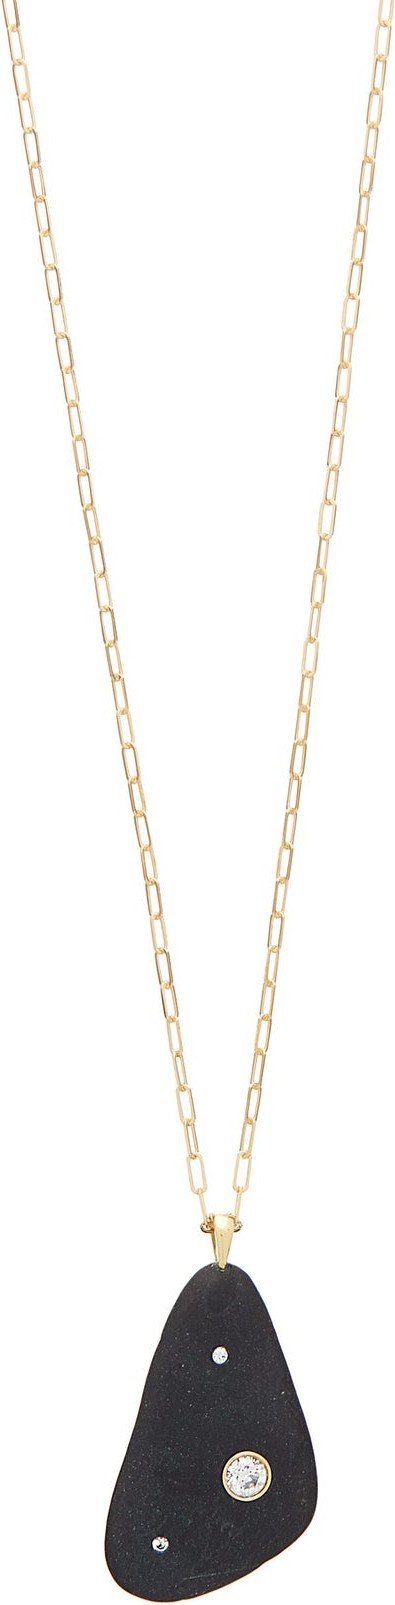 Cvc Stones Mythic diamond & 18kt gold necklace